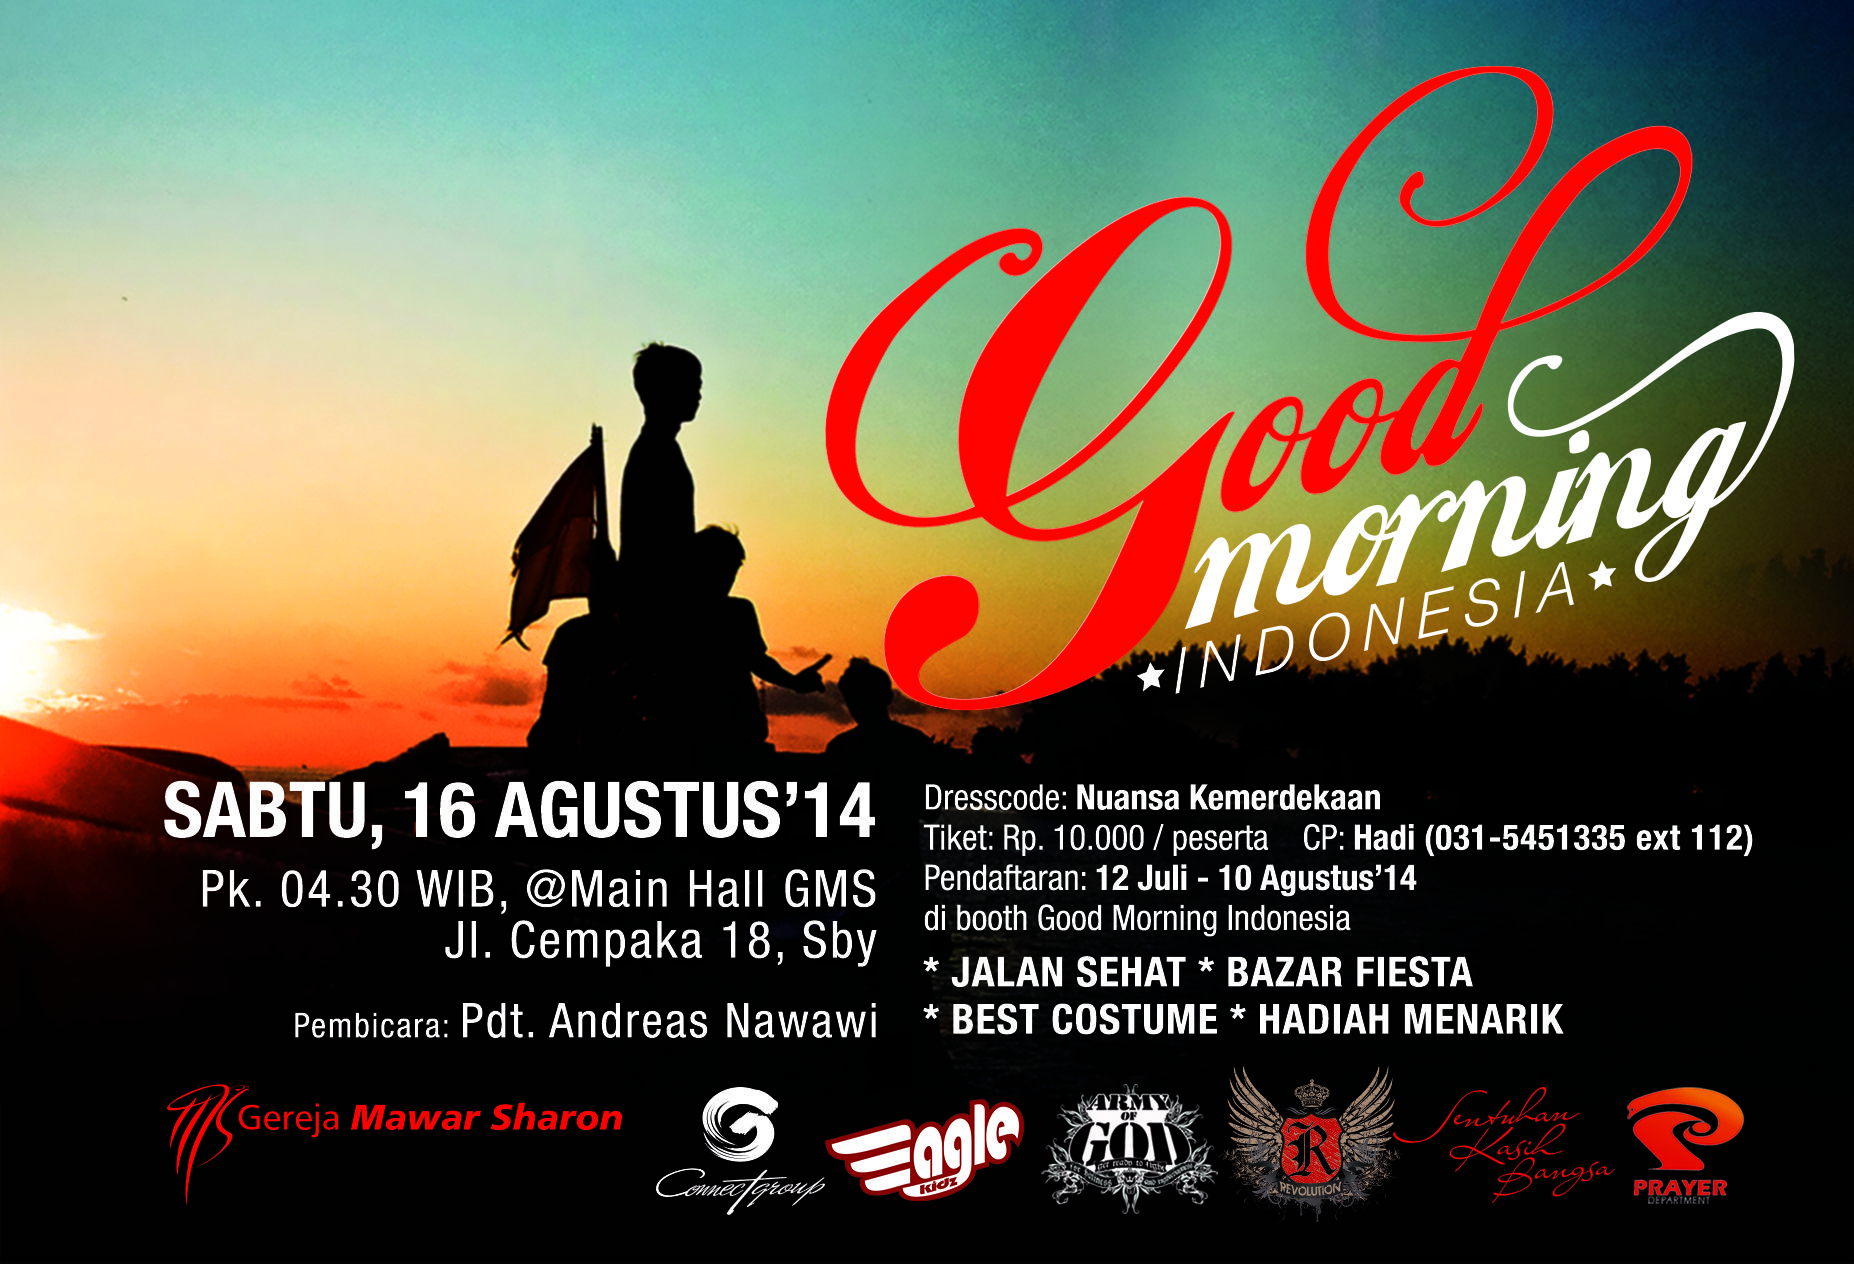 Good Morning Indonesia 16 Agustus 2014 Indonesia Gereja